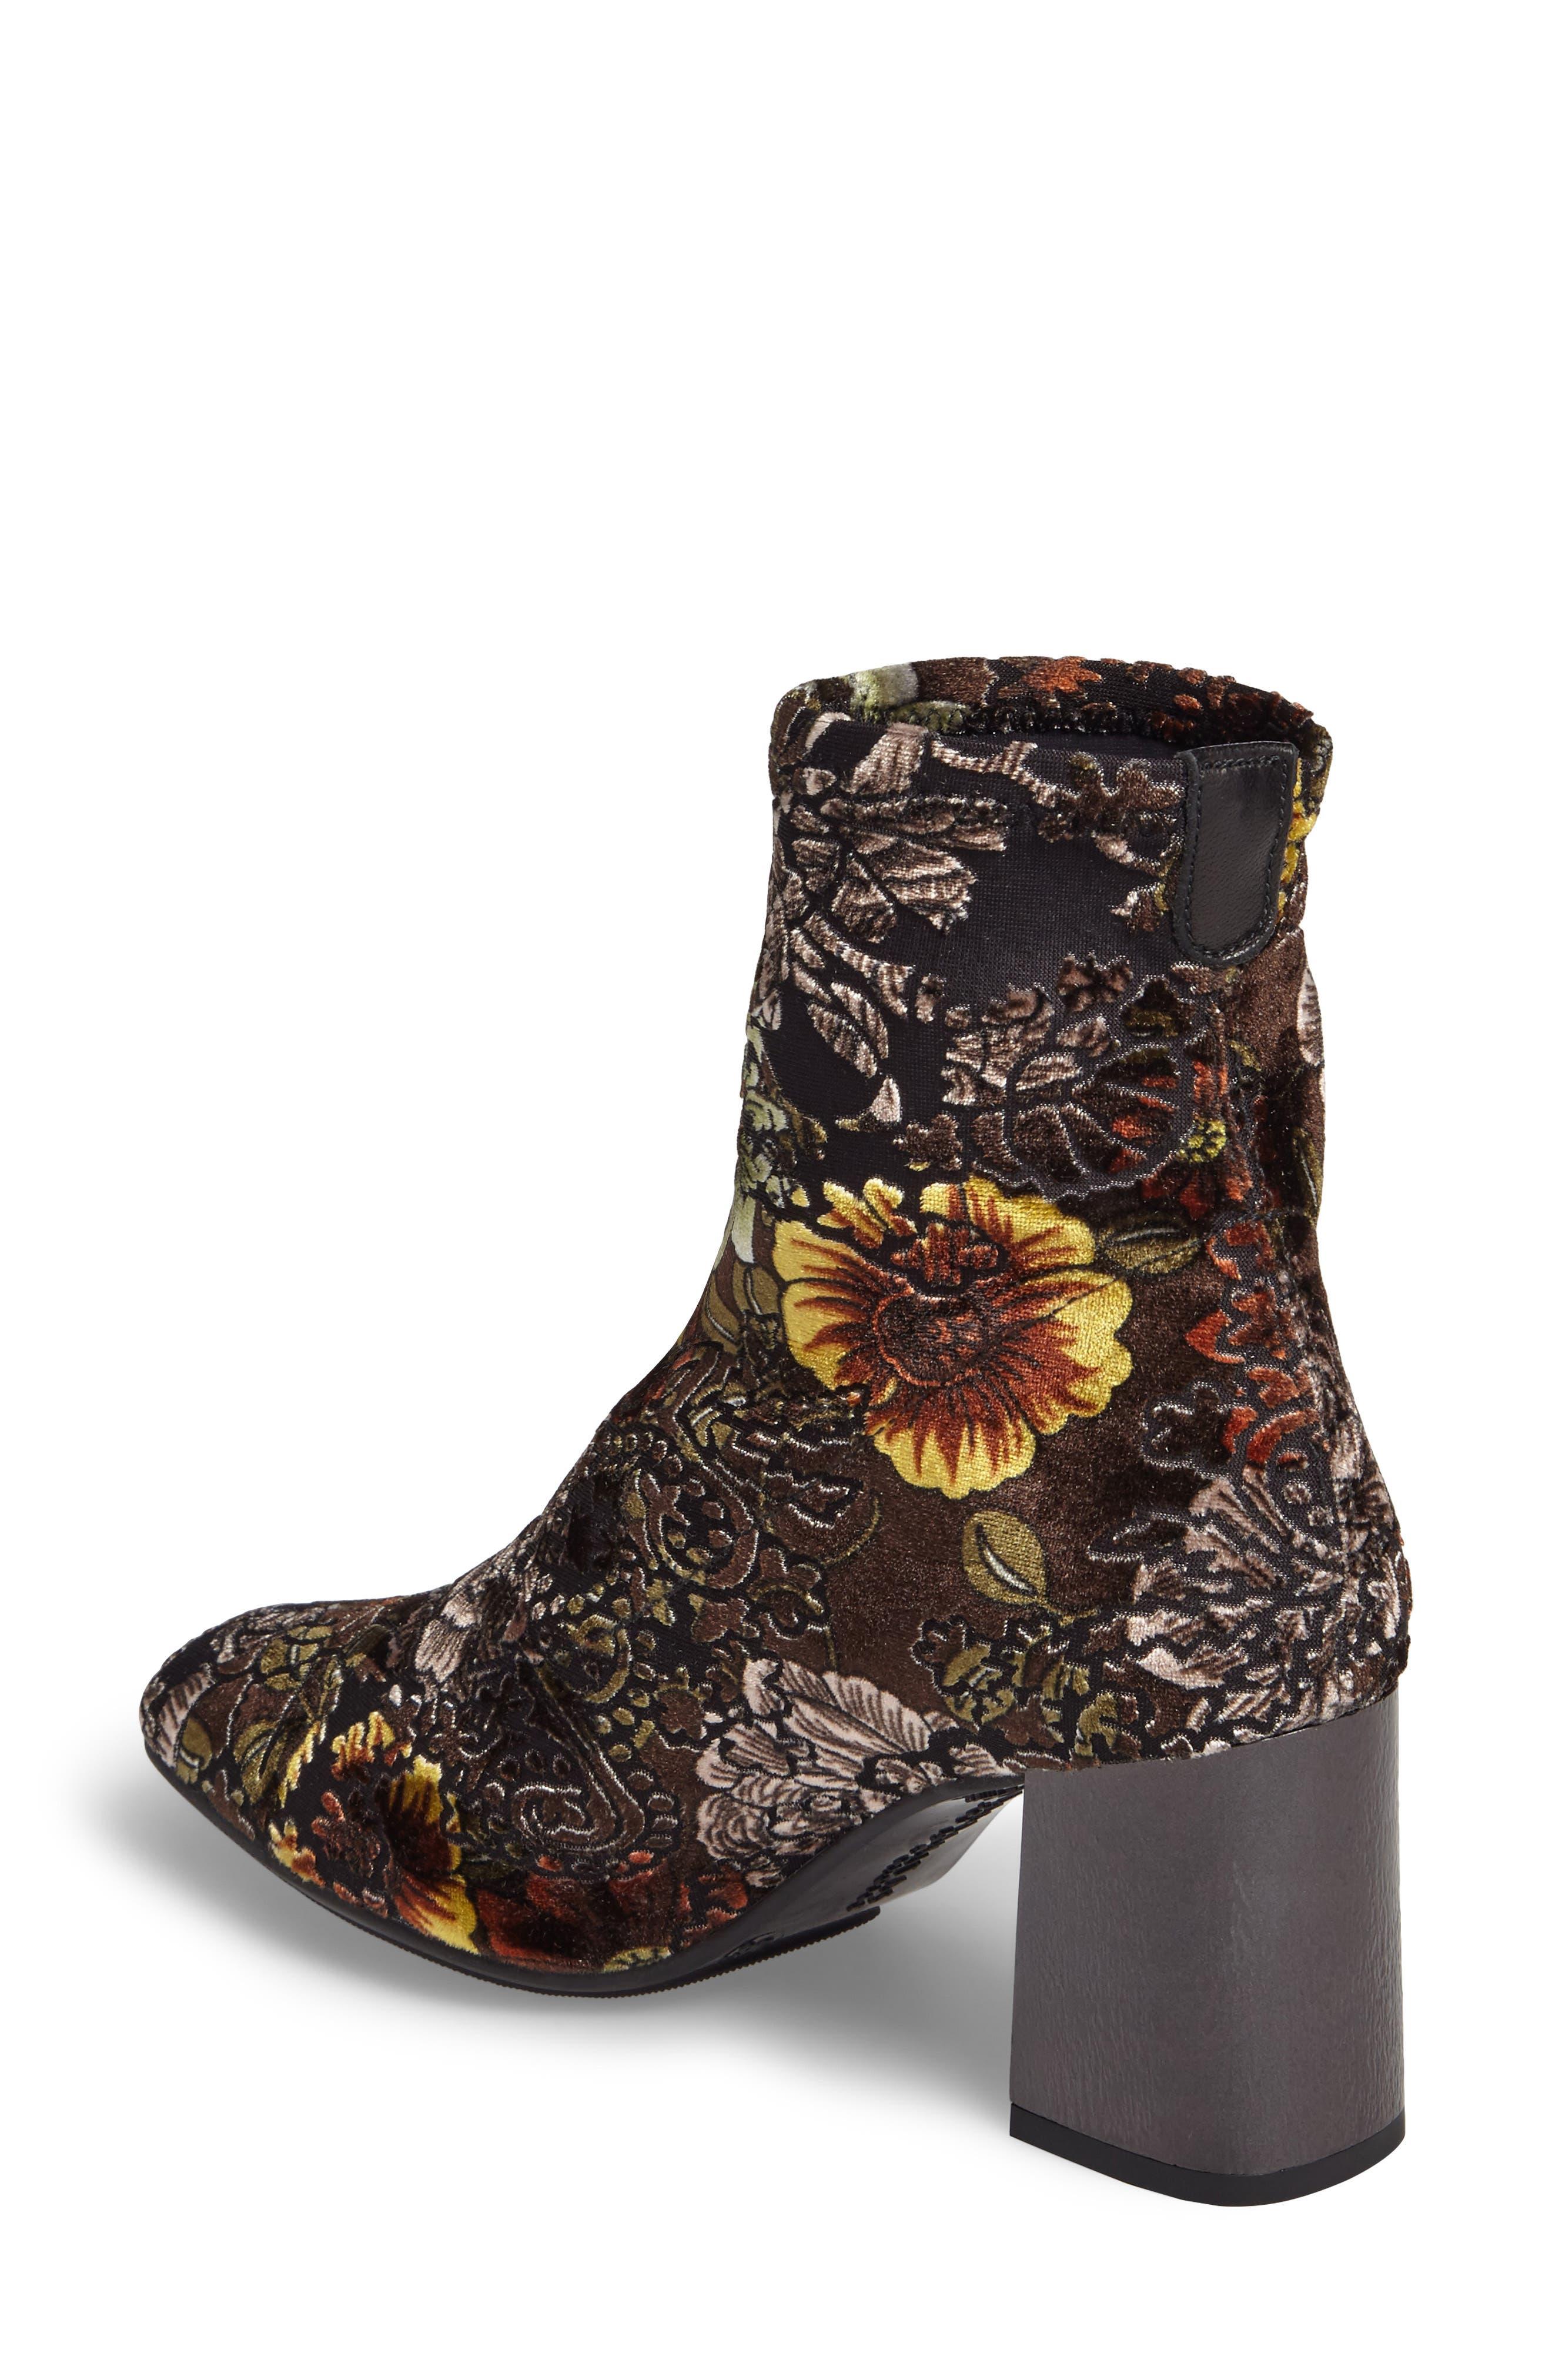 HISPANITAS, Portia Floral Stretch Velvet Bootie, Alternate thumbnail 2, color, CARAVAGGIO FABRIC